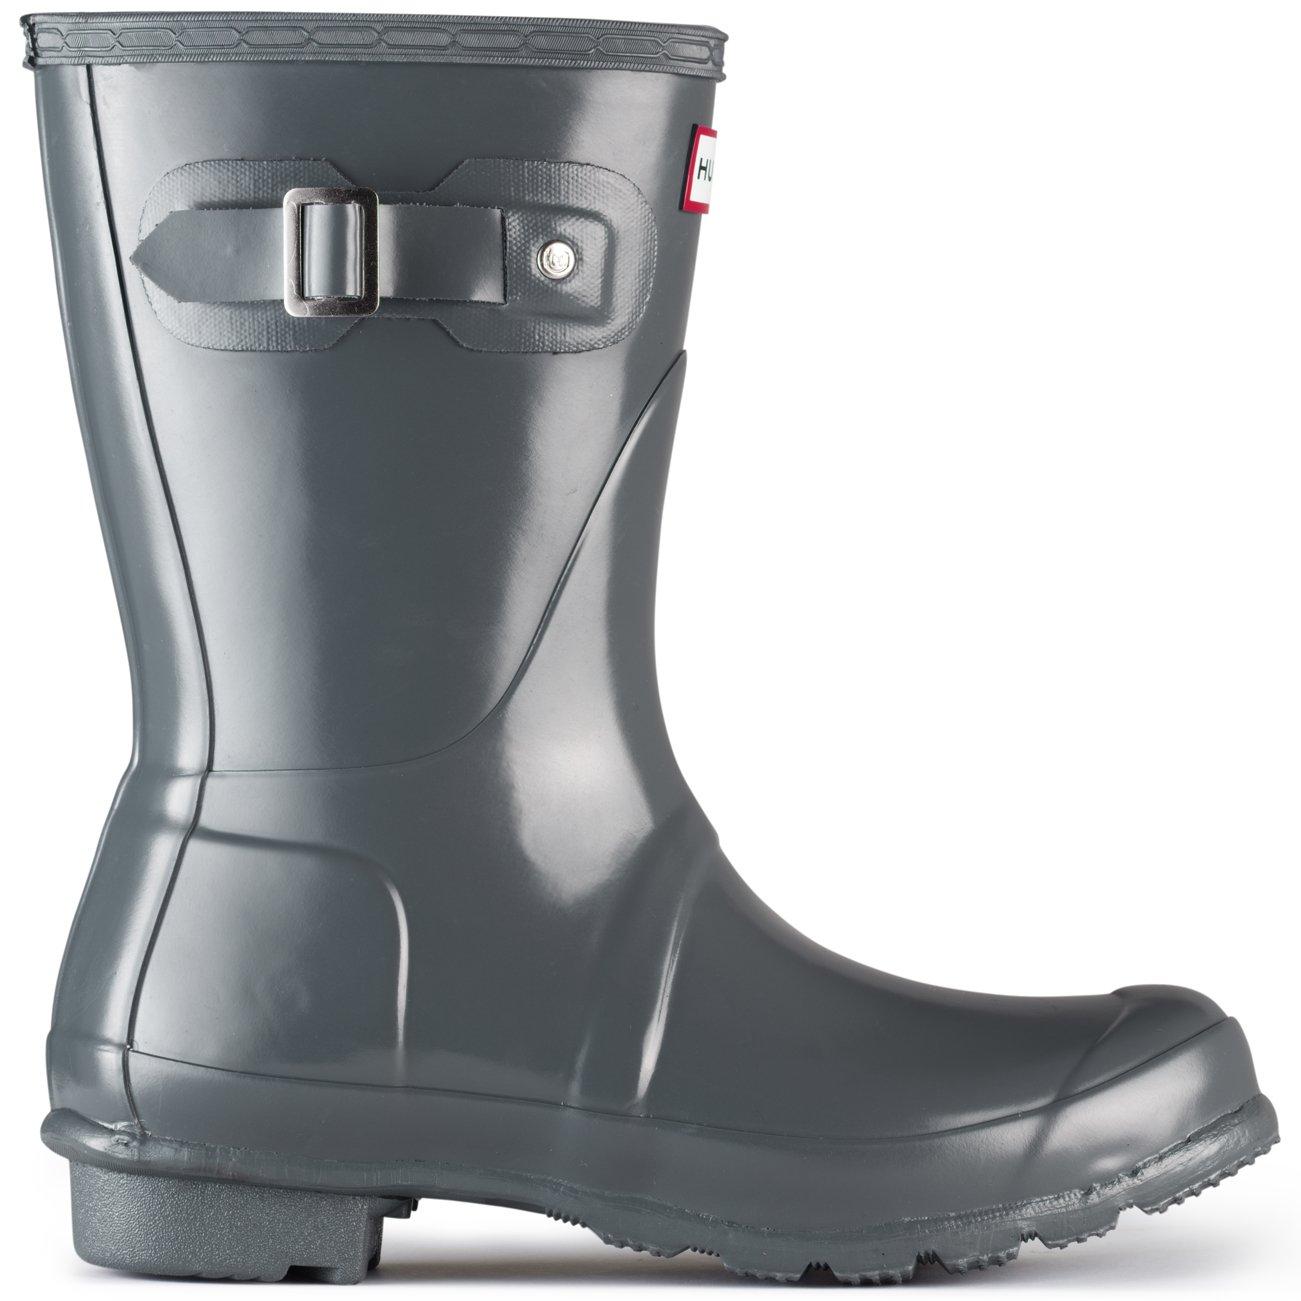 Hunter-WFS1000RGL-Women-039-s-Original-Short-Gloss-Boots-All-Colors thumbnail 22